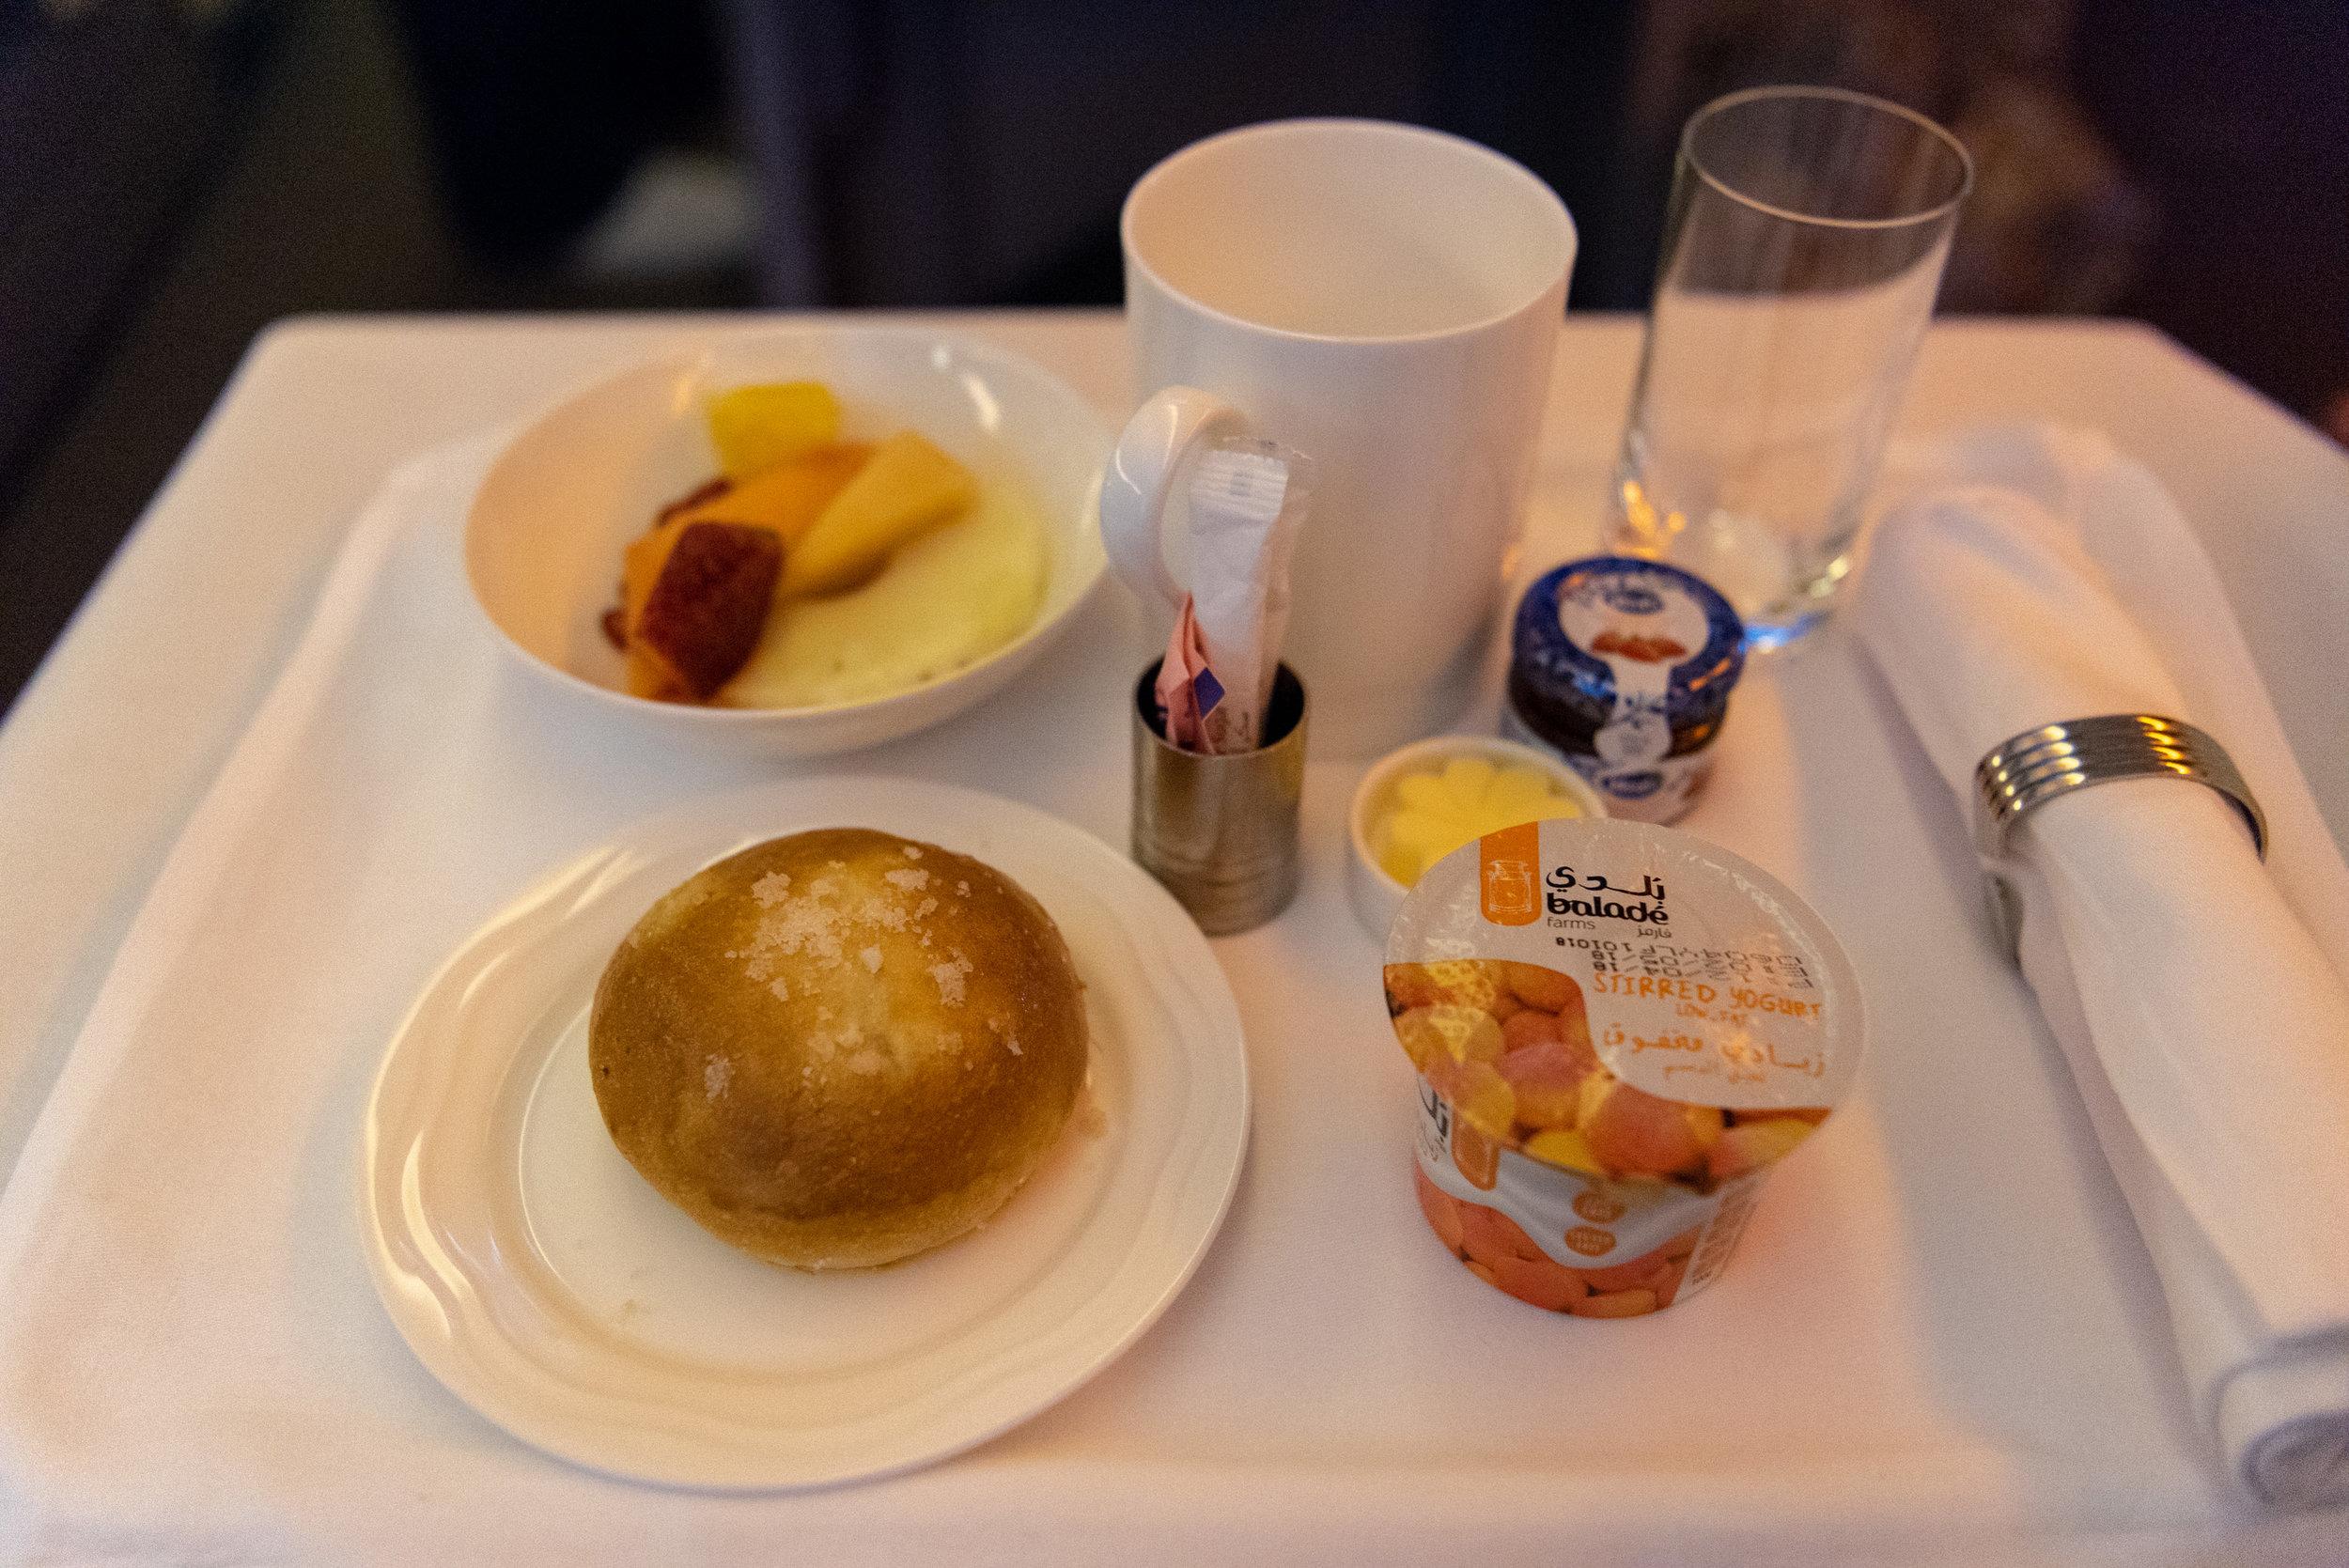 Continental Breakfast  Emirates EK352 Business Class 777-300ER - DXB to SIN